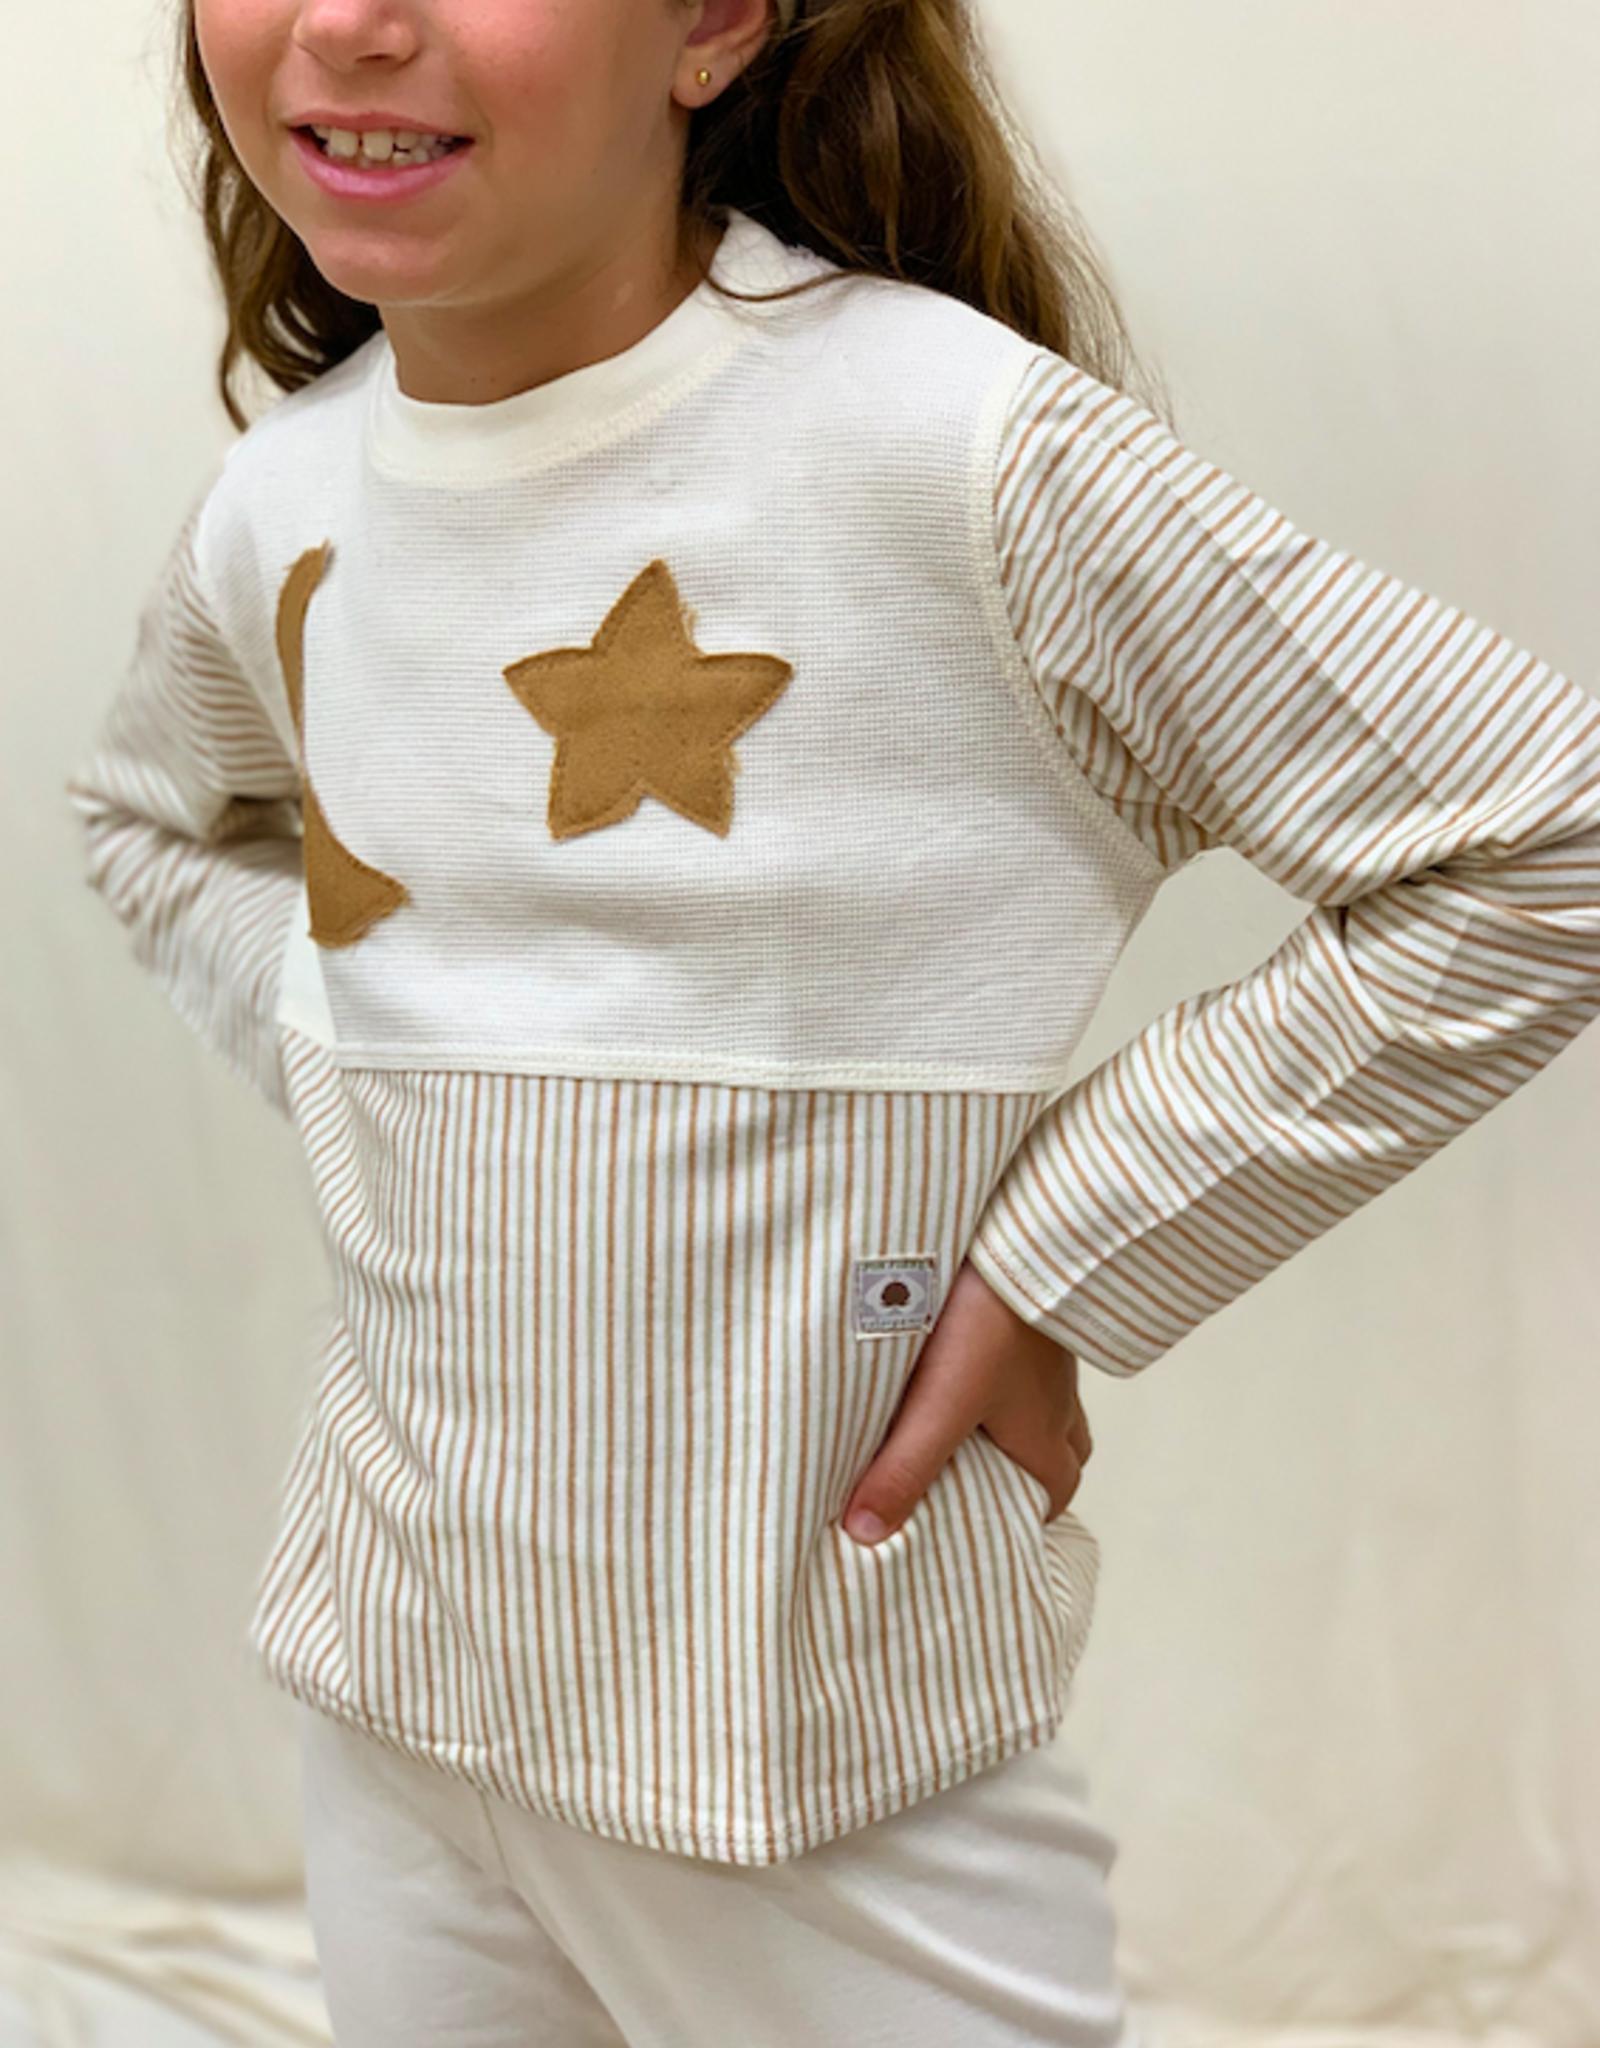 Pijama junior manga curta luna estrella. Tallas 4, 6, 8 años.